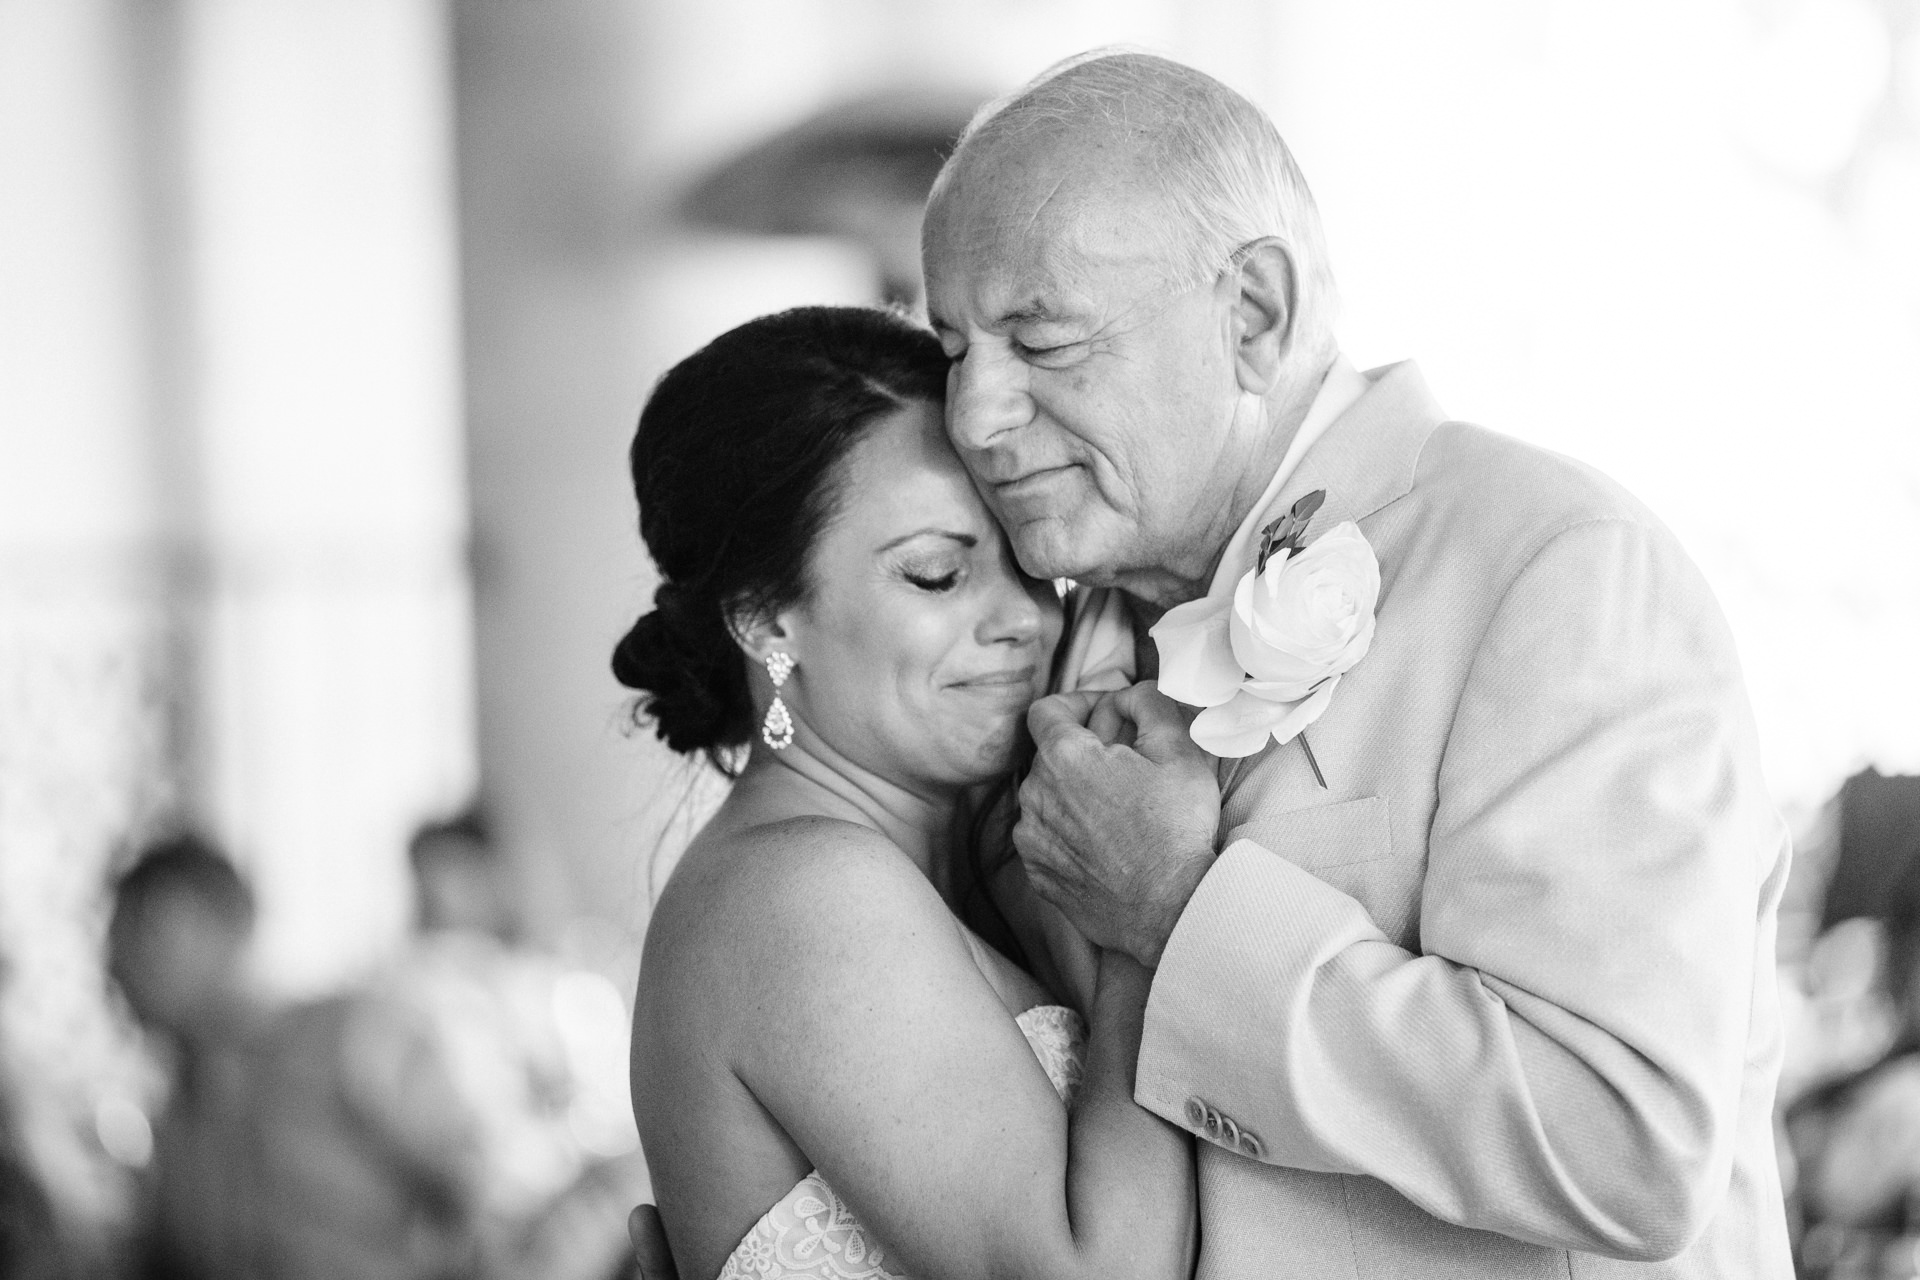 Grant Beachy Tammy Chris wedding photography goshen Saint Joseph veranda whitcomb-069.jpg